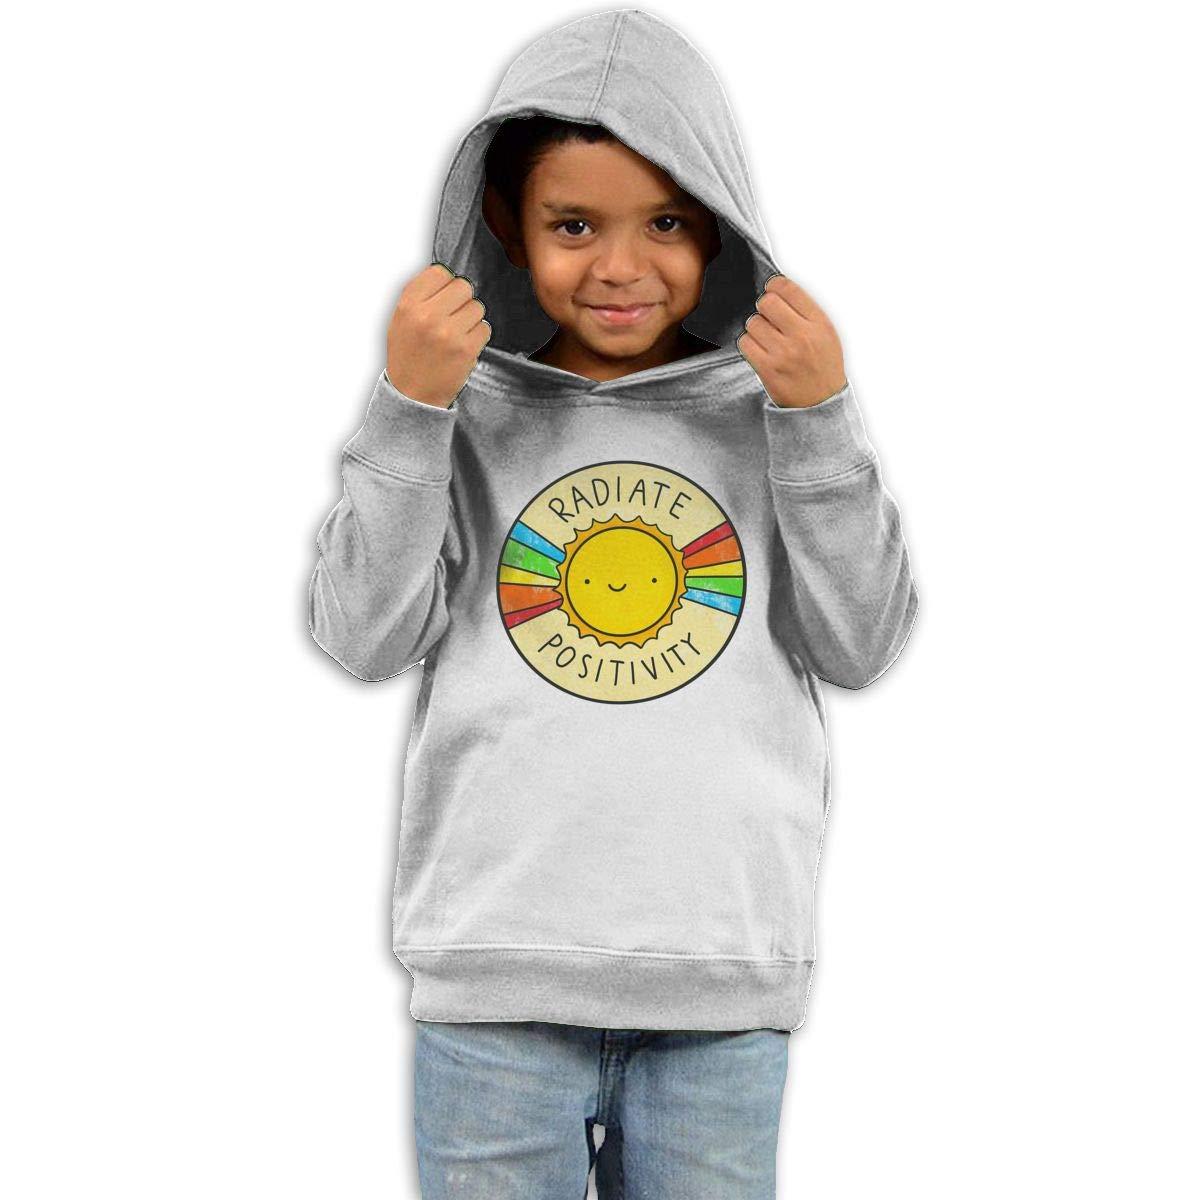 Stacy J. Payne Kids Radiate Positivity Fashion Hoody39 White